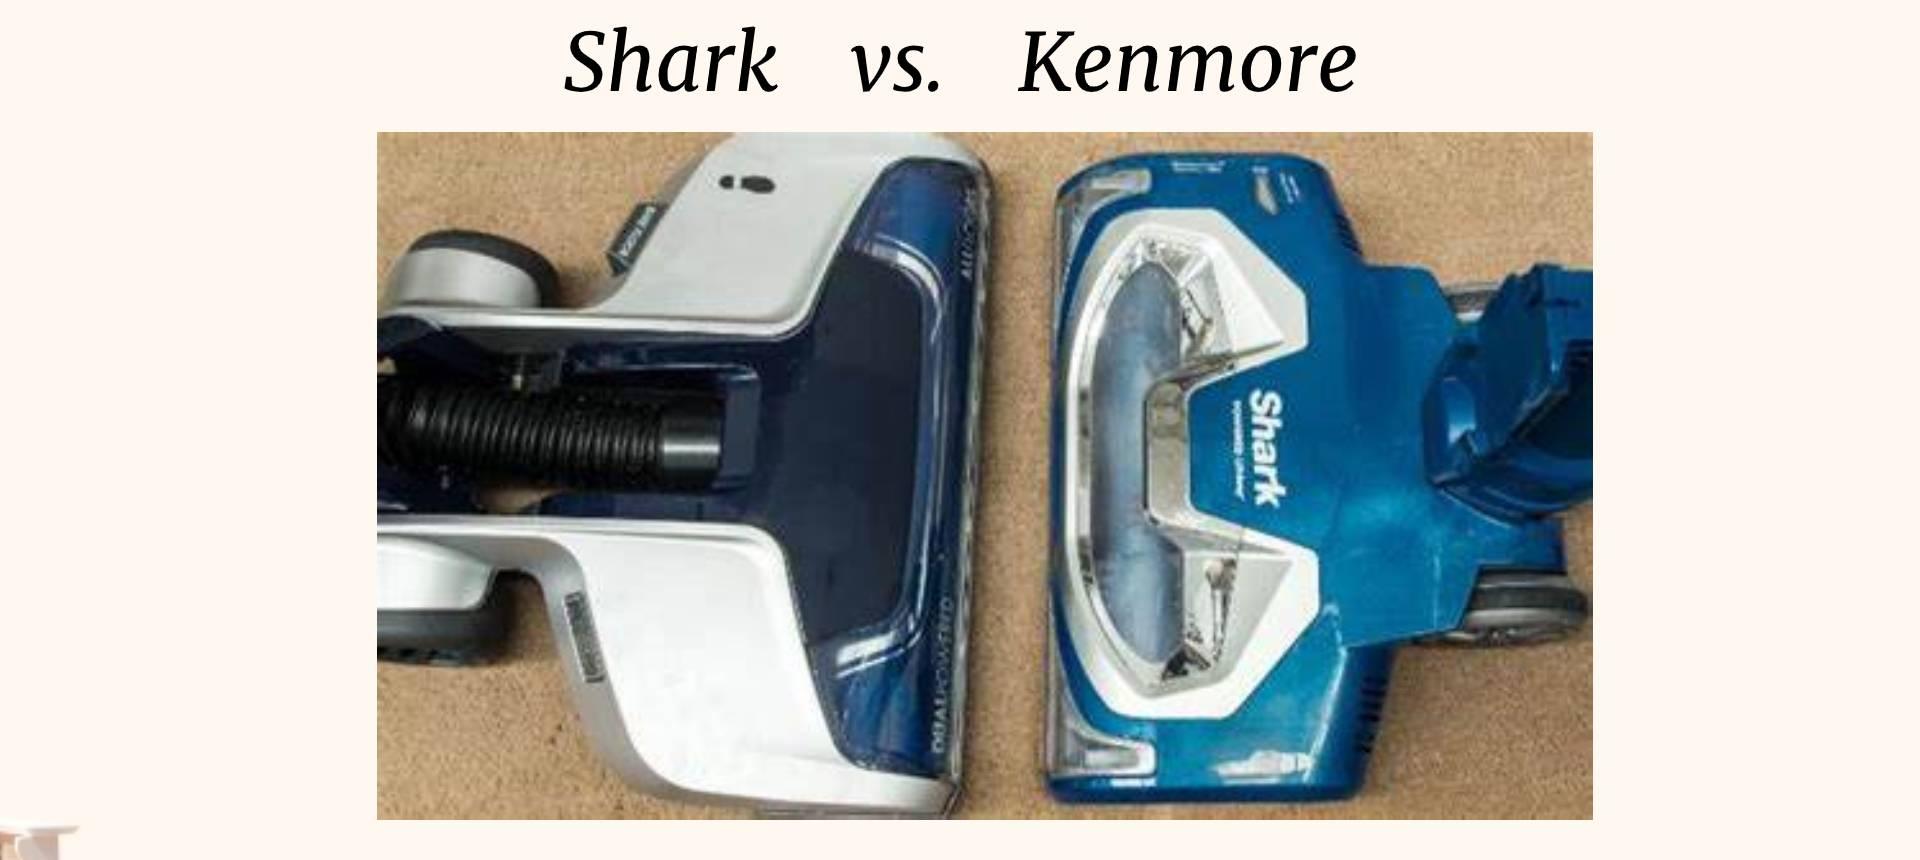 Shark vs. Kenmore